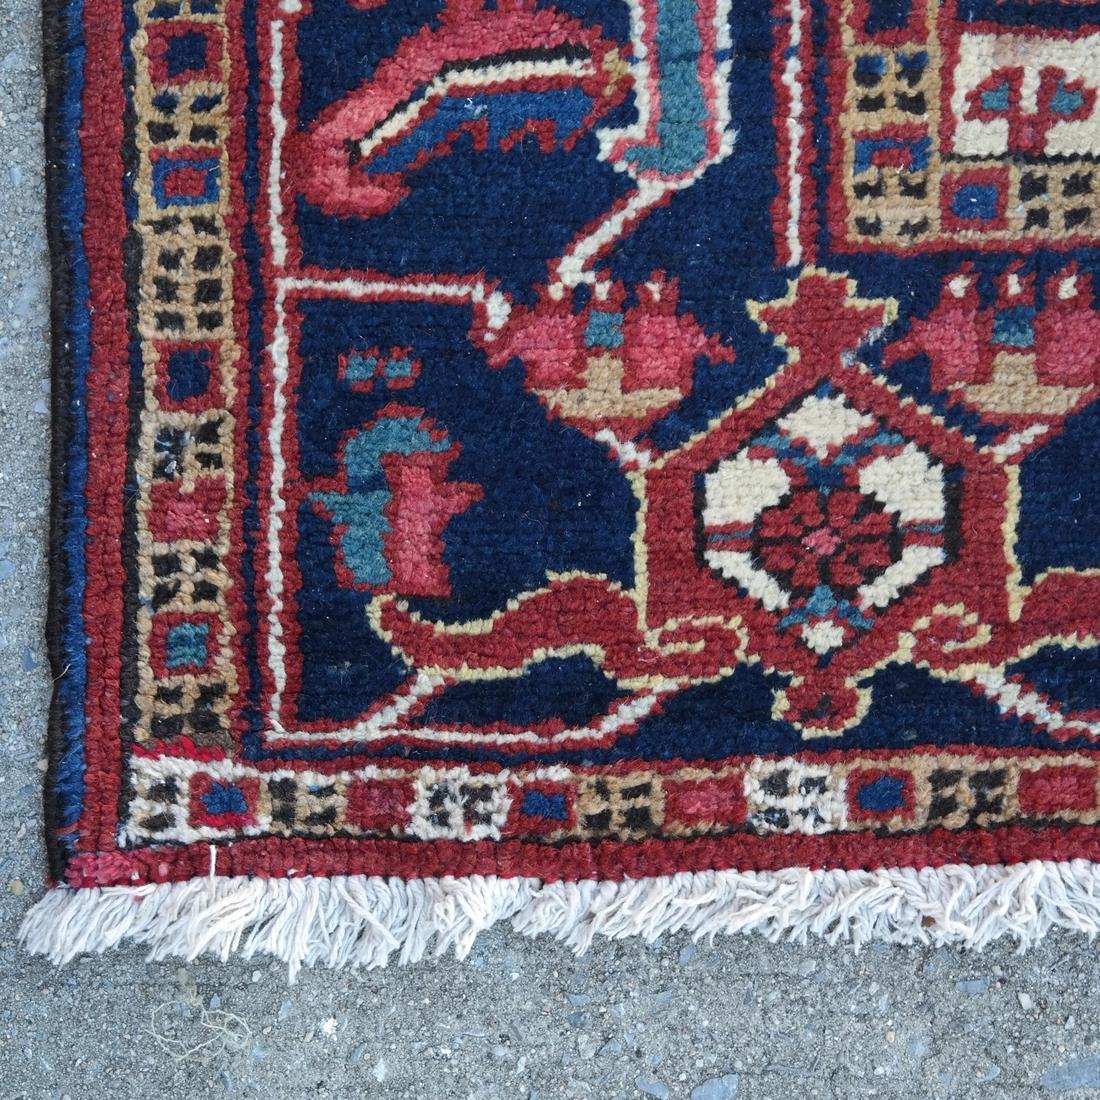 Antique Iranian Heriz Carpet, 9 x 12 - 7